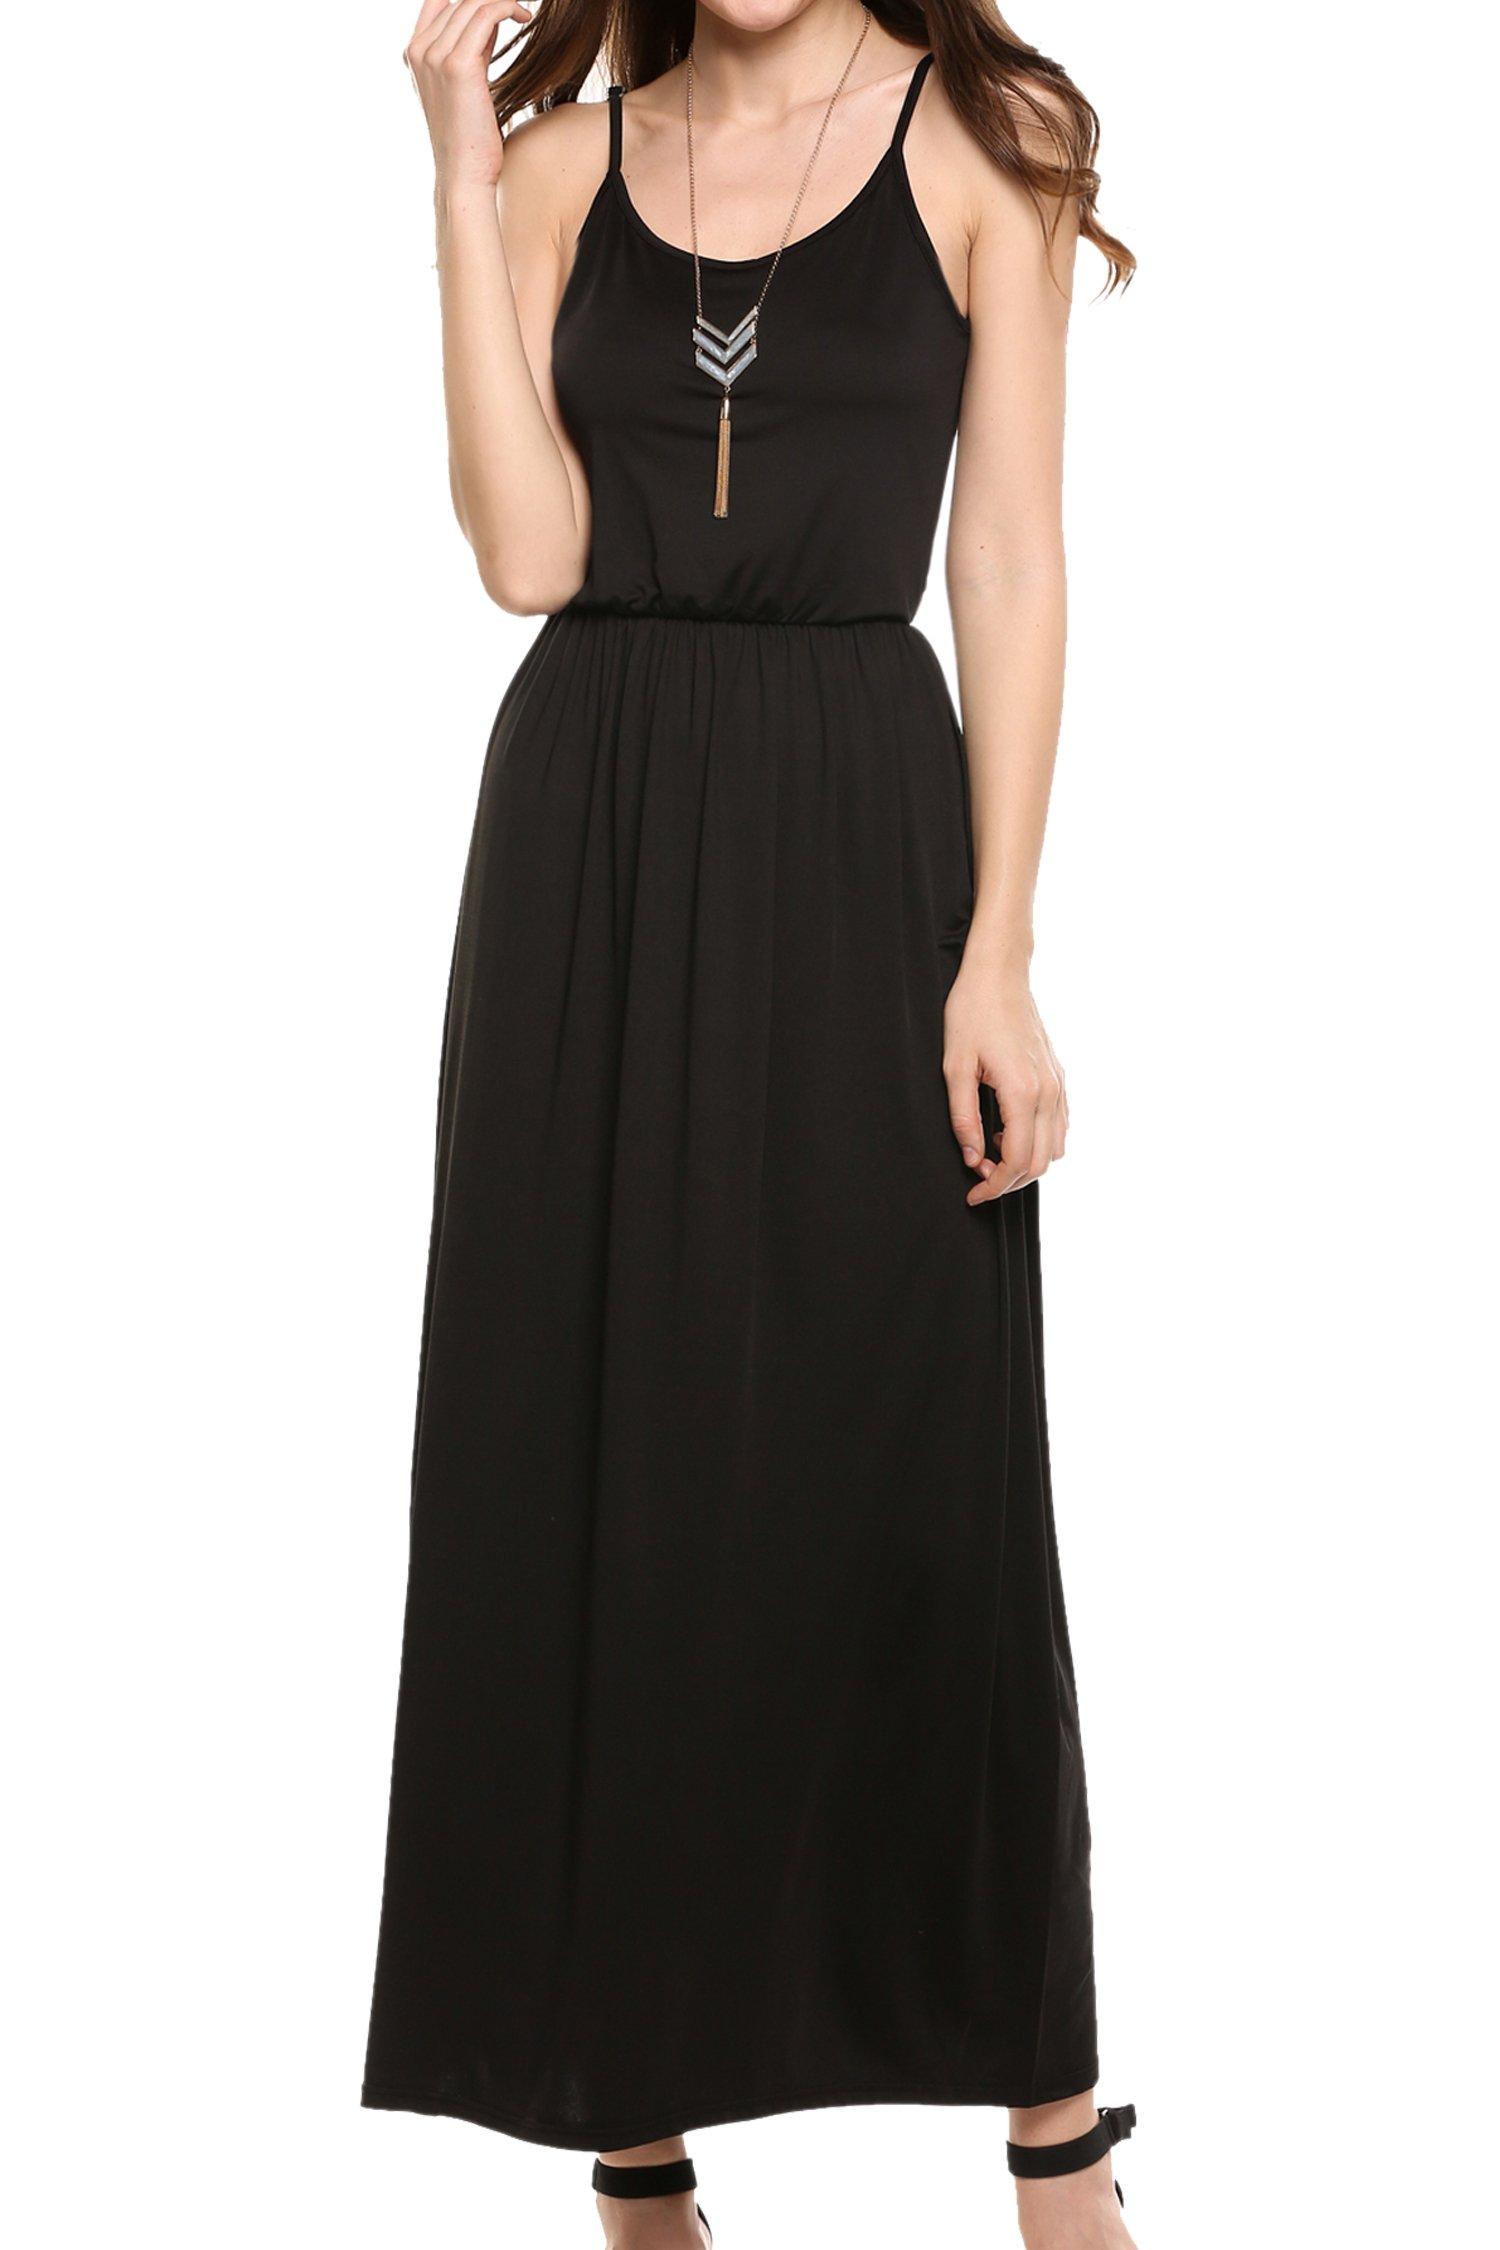 Meaneor Women's Adjustable Slip Dress Spaghetti Strap Long Maxi Dresses Black S